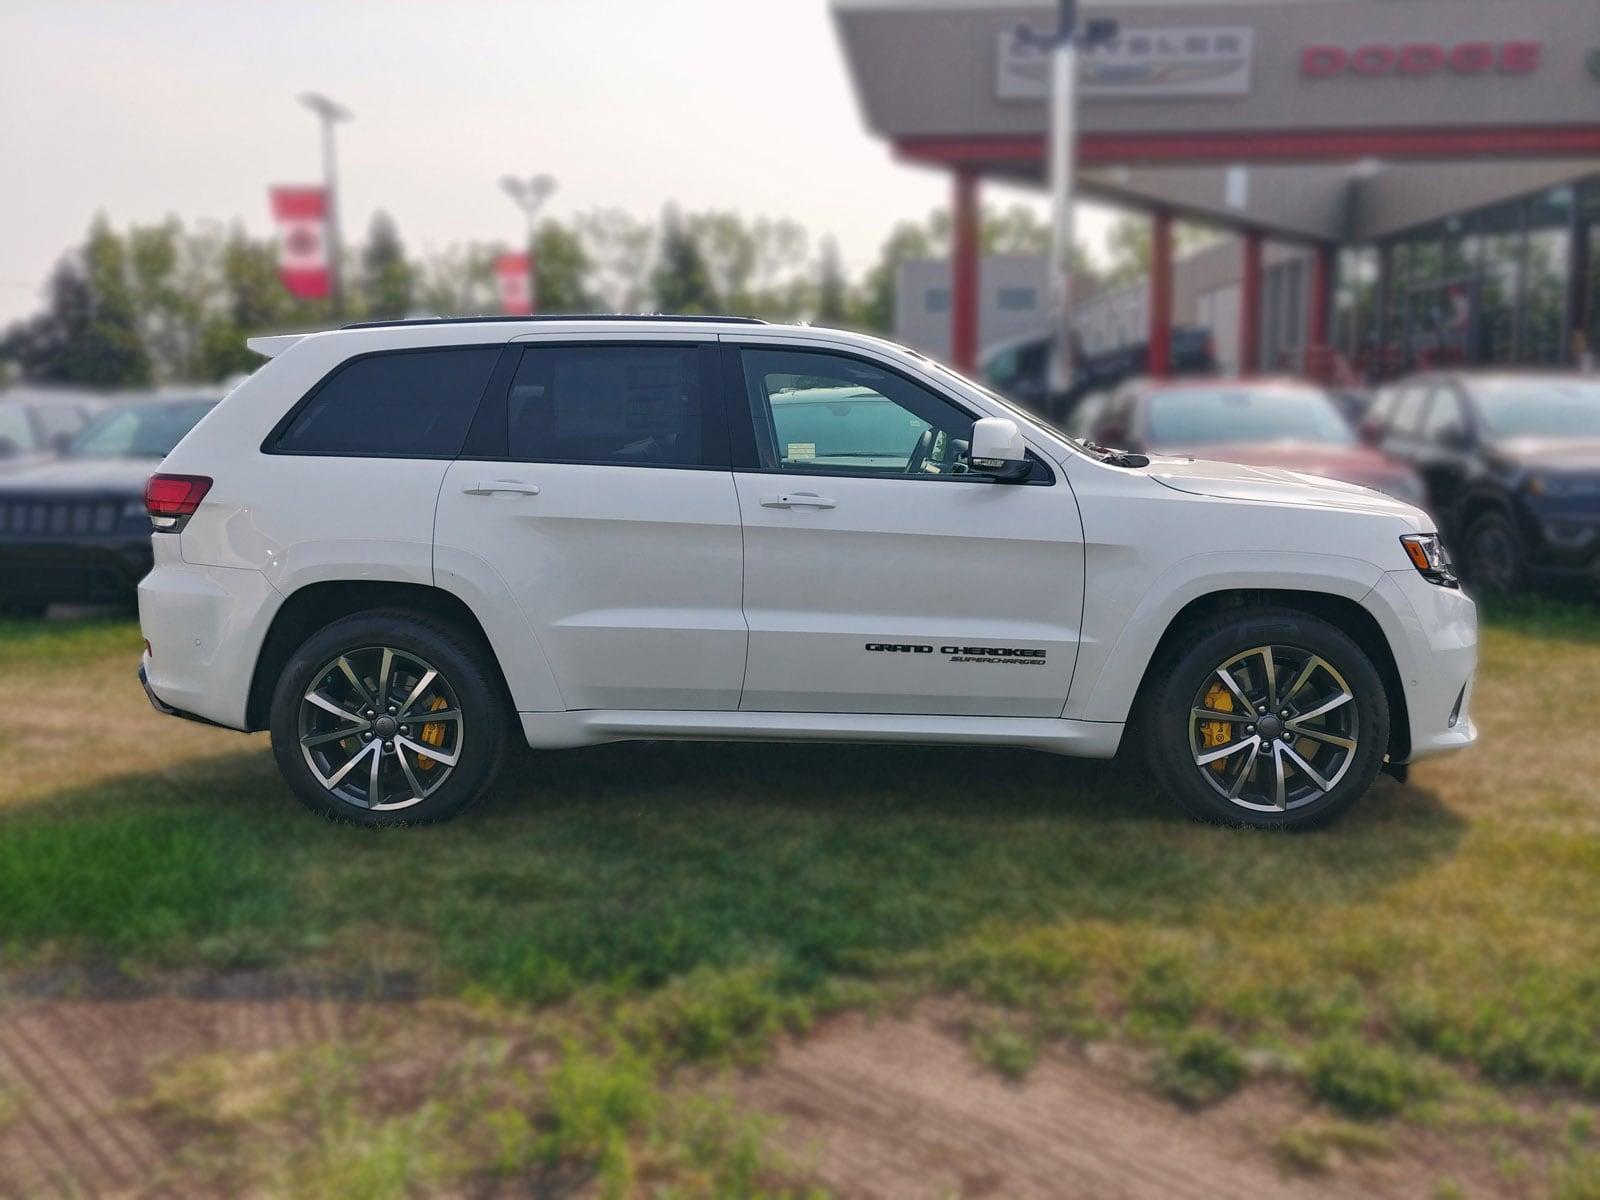 New 2018 Jeep Grand Cherokee Trackhawk SUV Calgary, AB